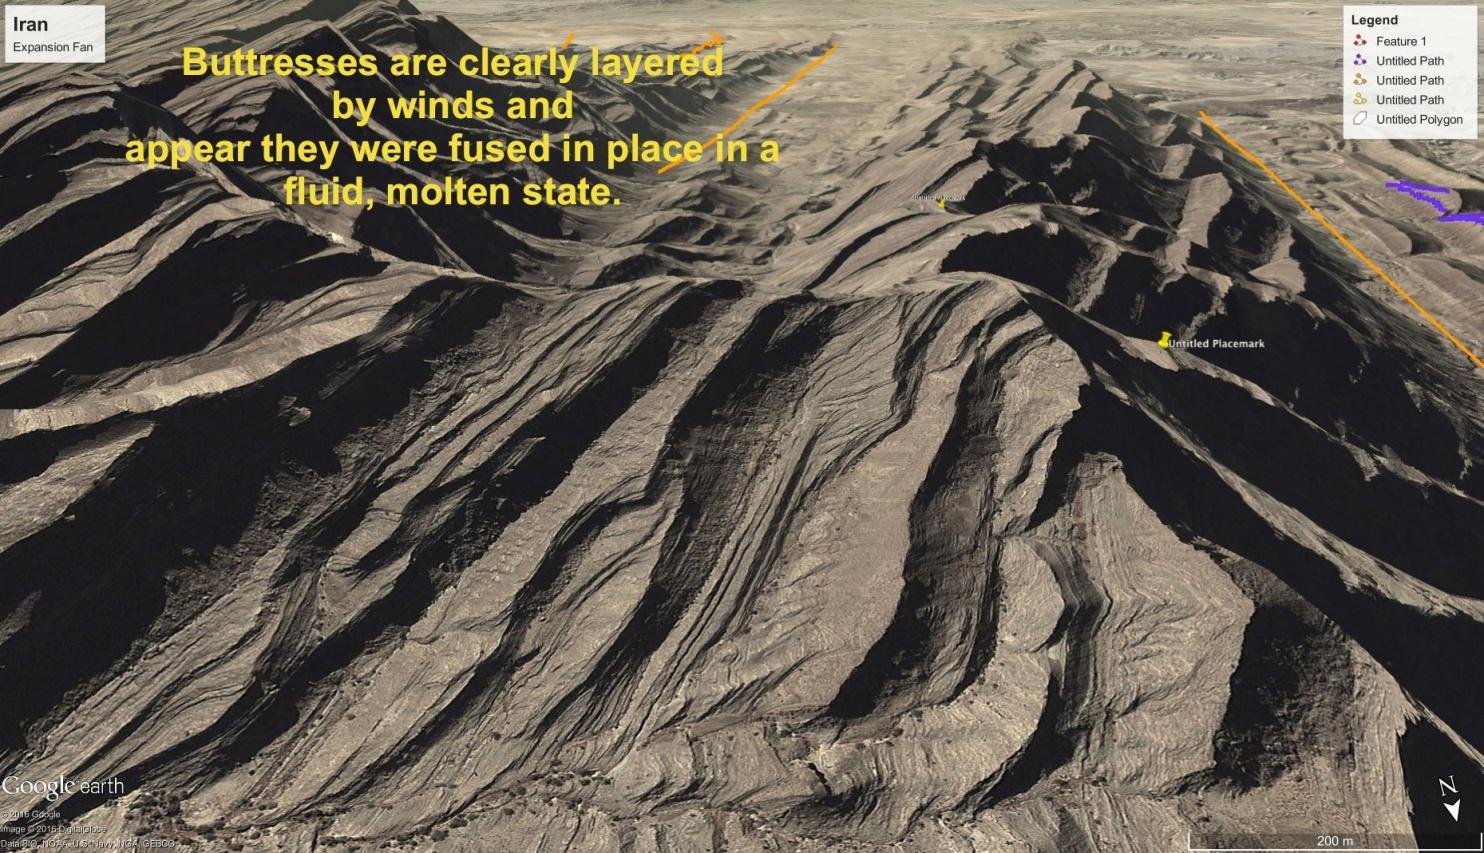 Arc Blast: Electric Carving of Planet Earth Aexpfaniran5